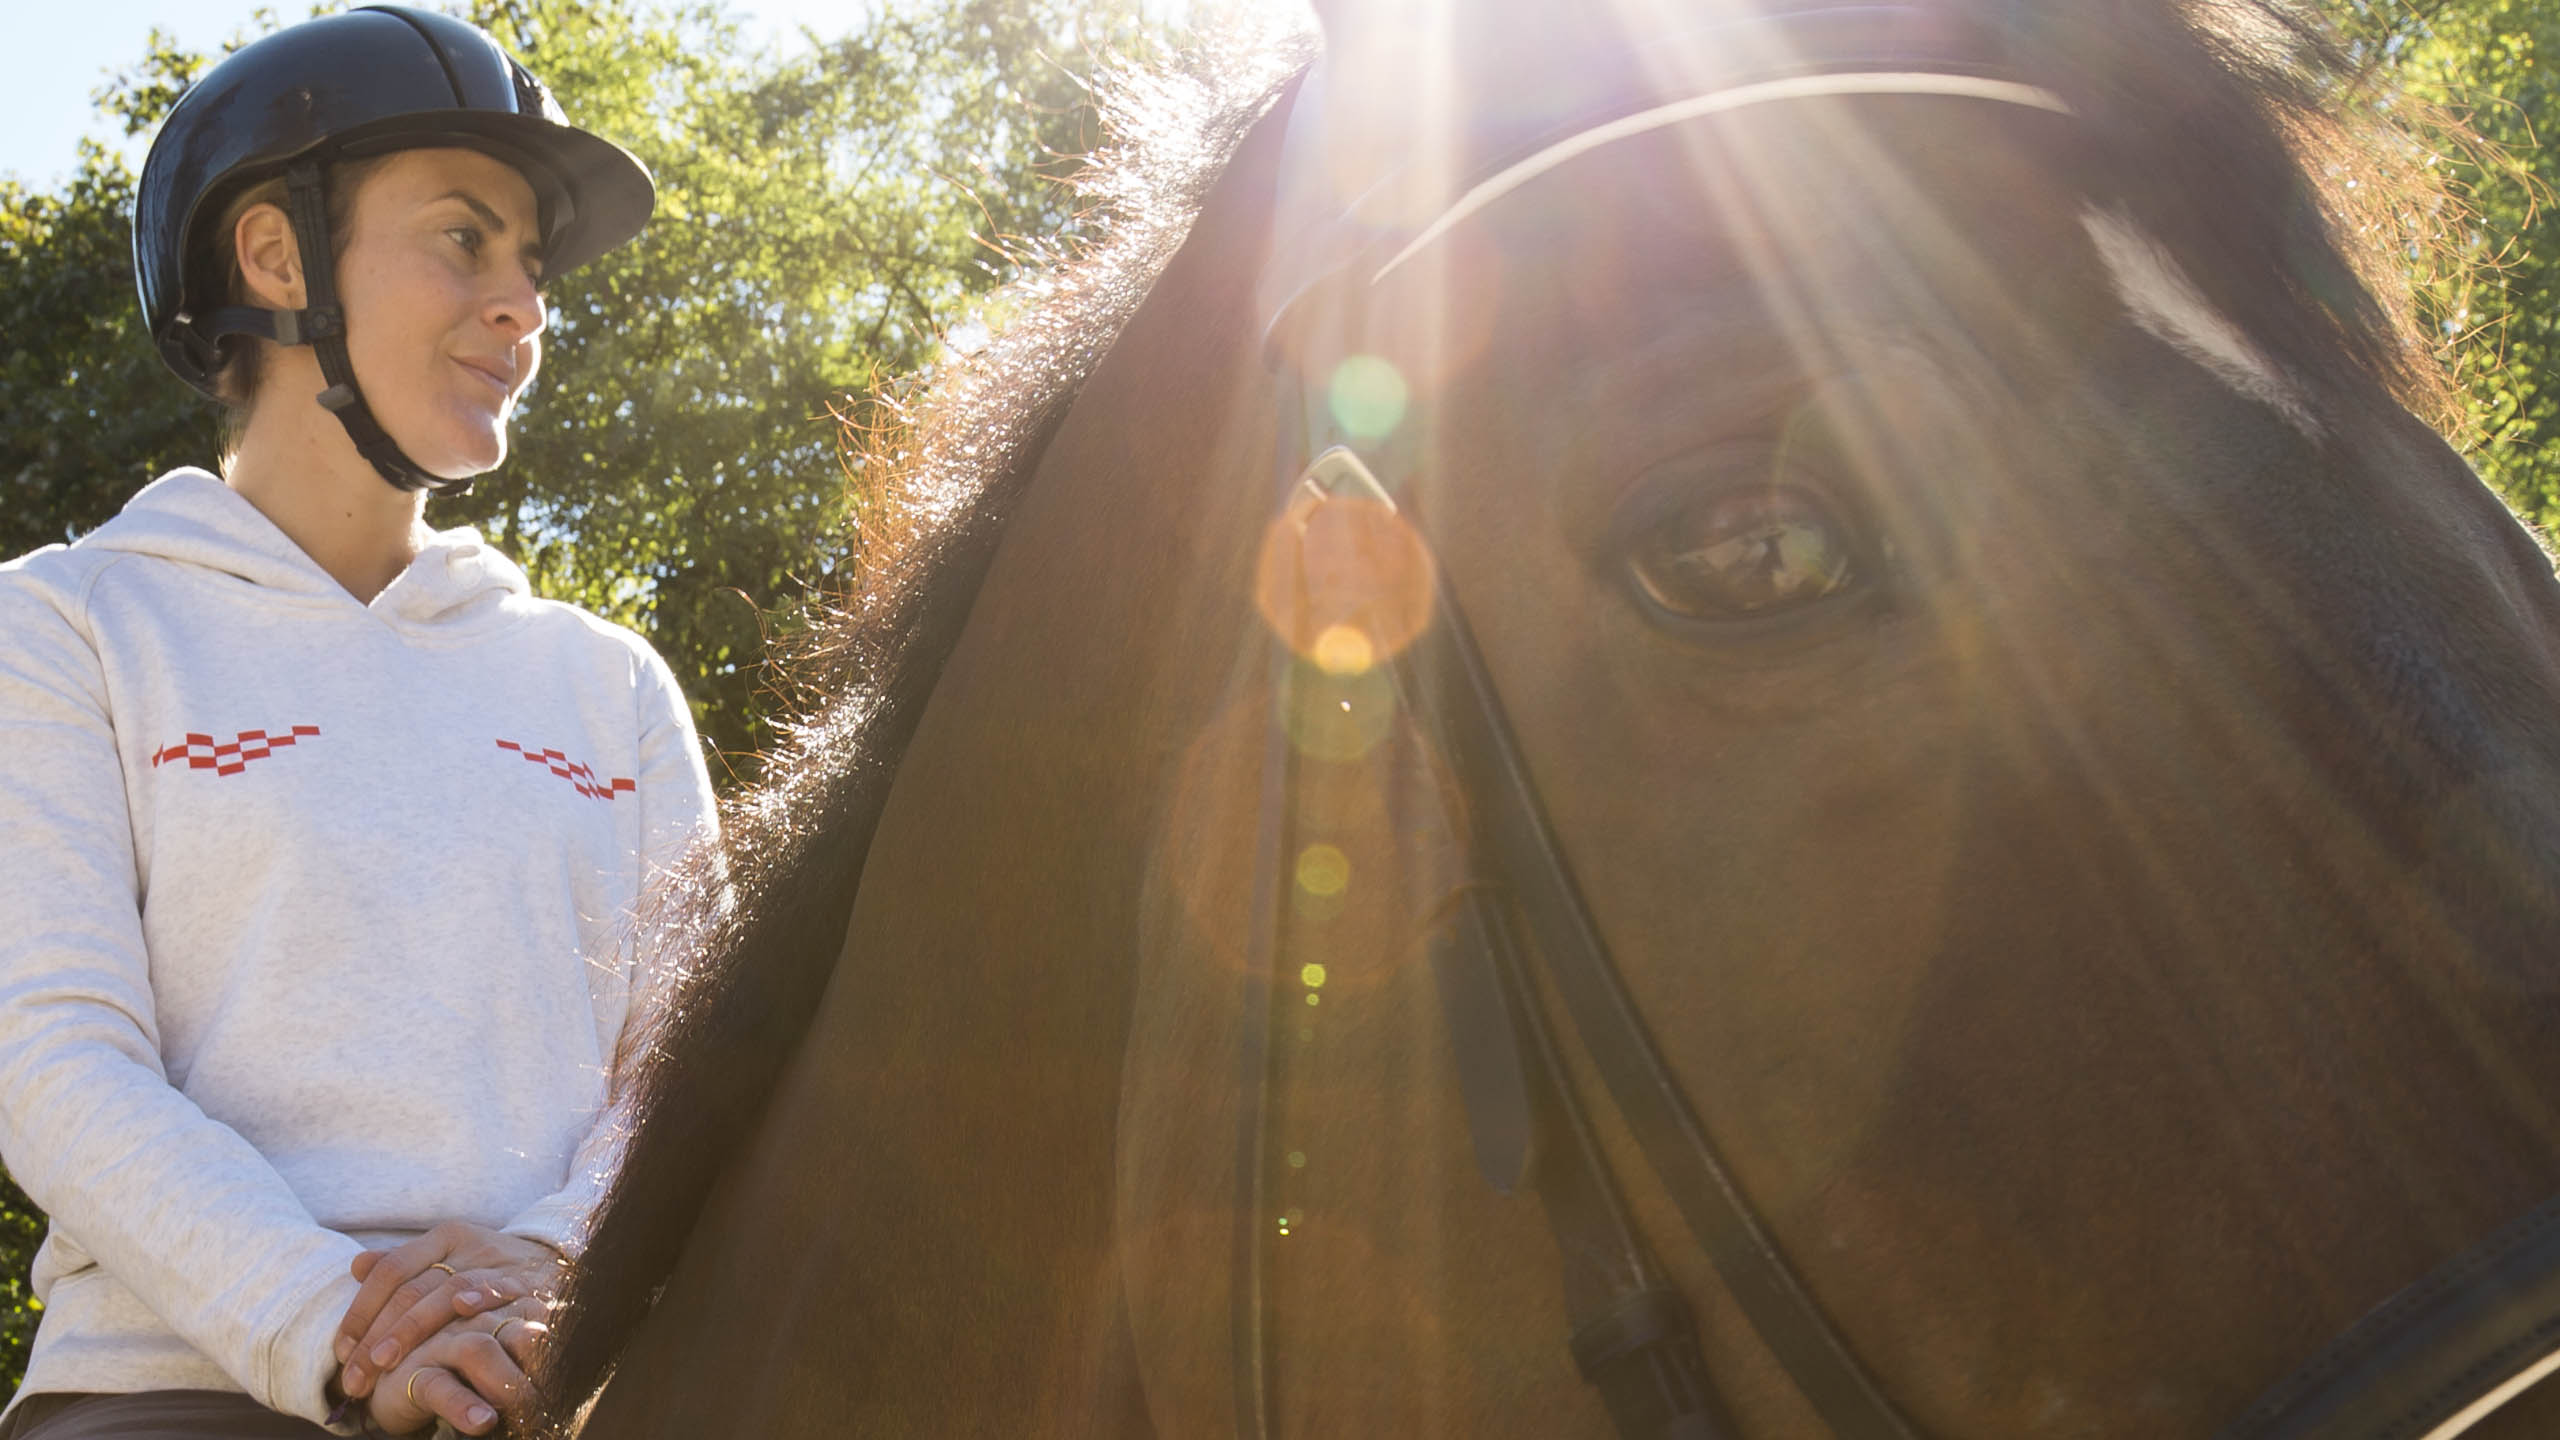 Paris – Raphaelle, The Equestrian 3